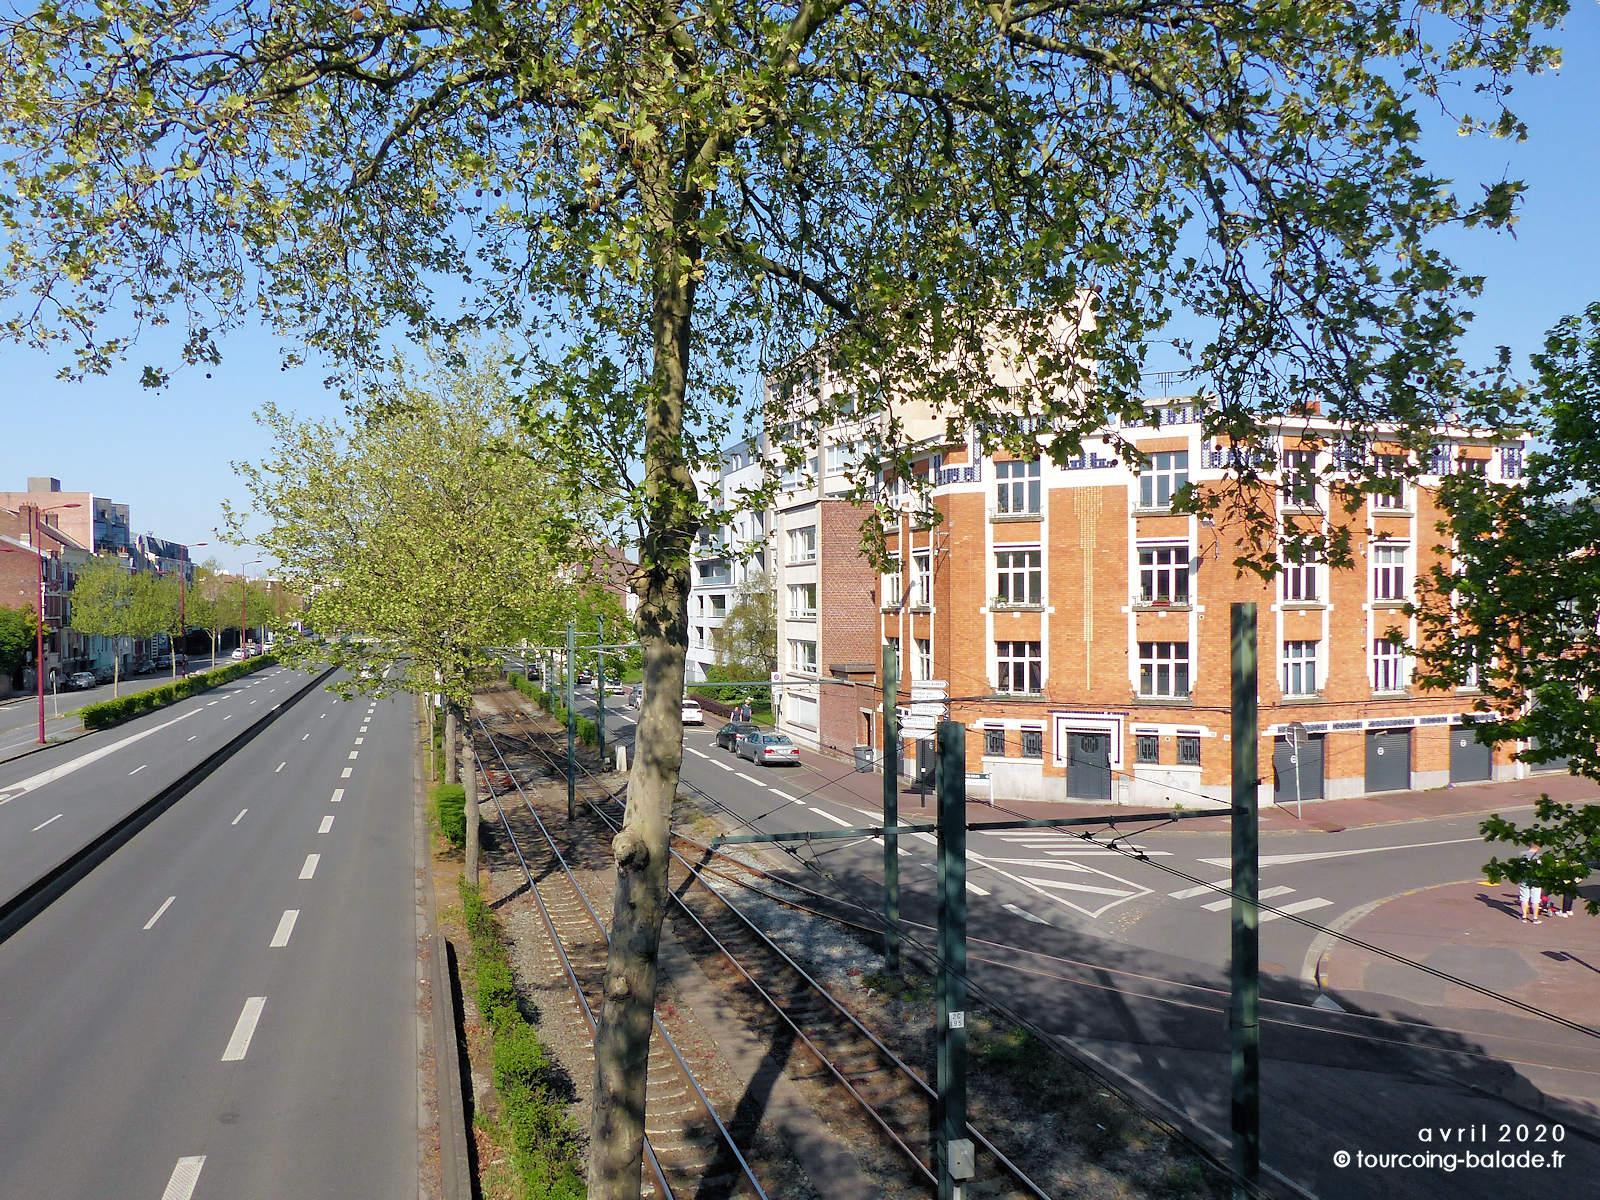 Avenue de la République, Marcq-en-Baroeul, 2020